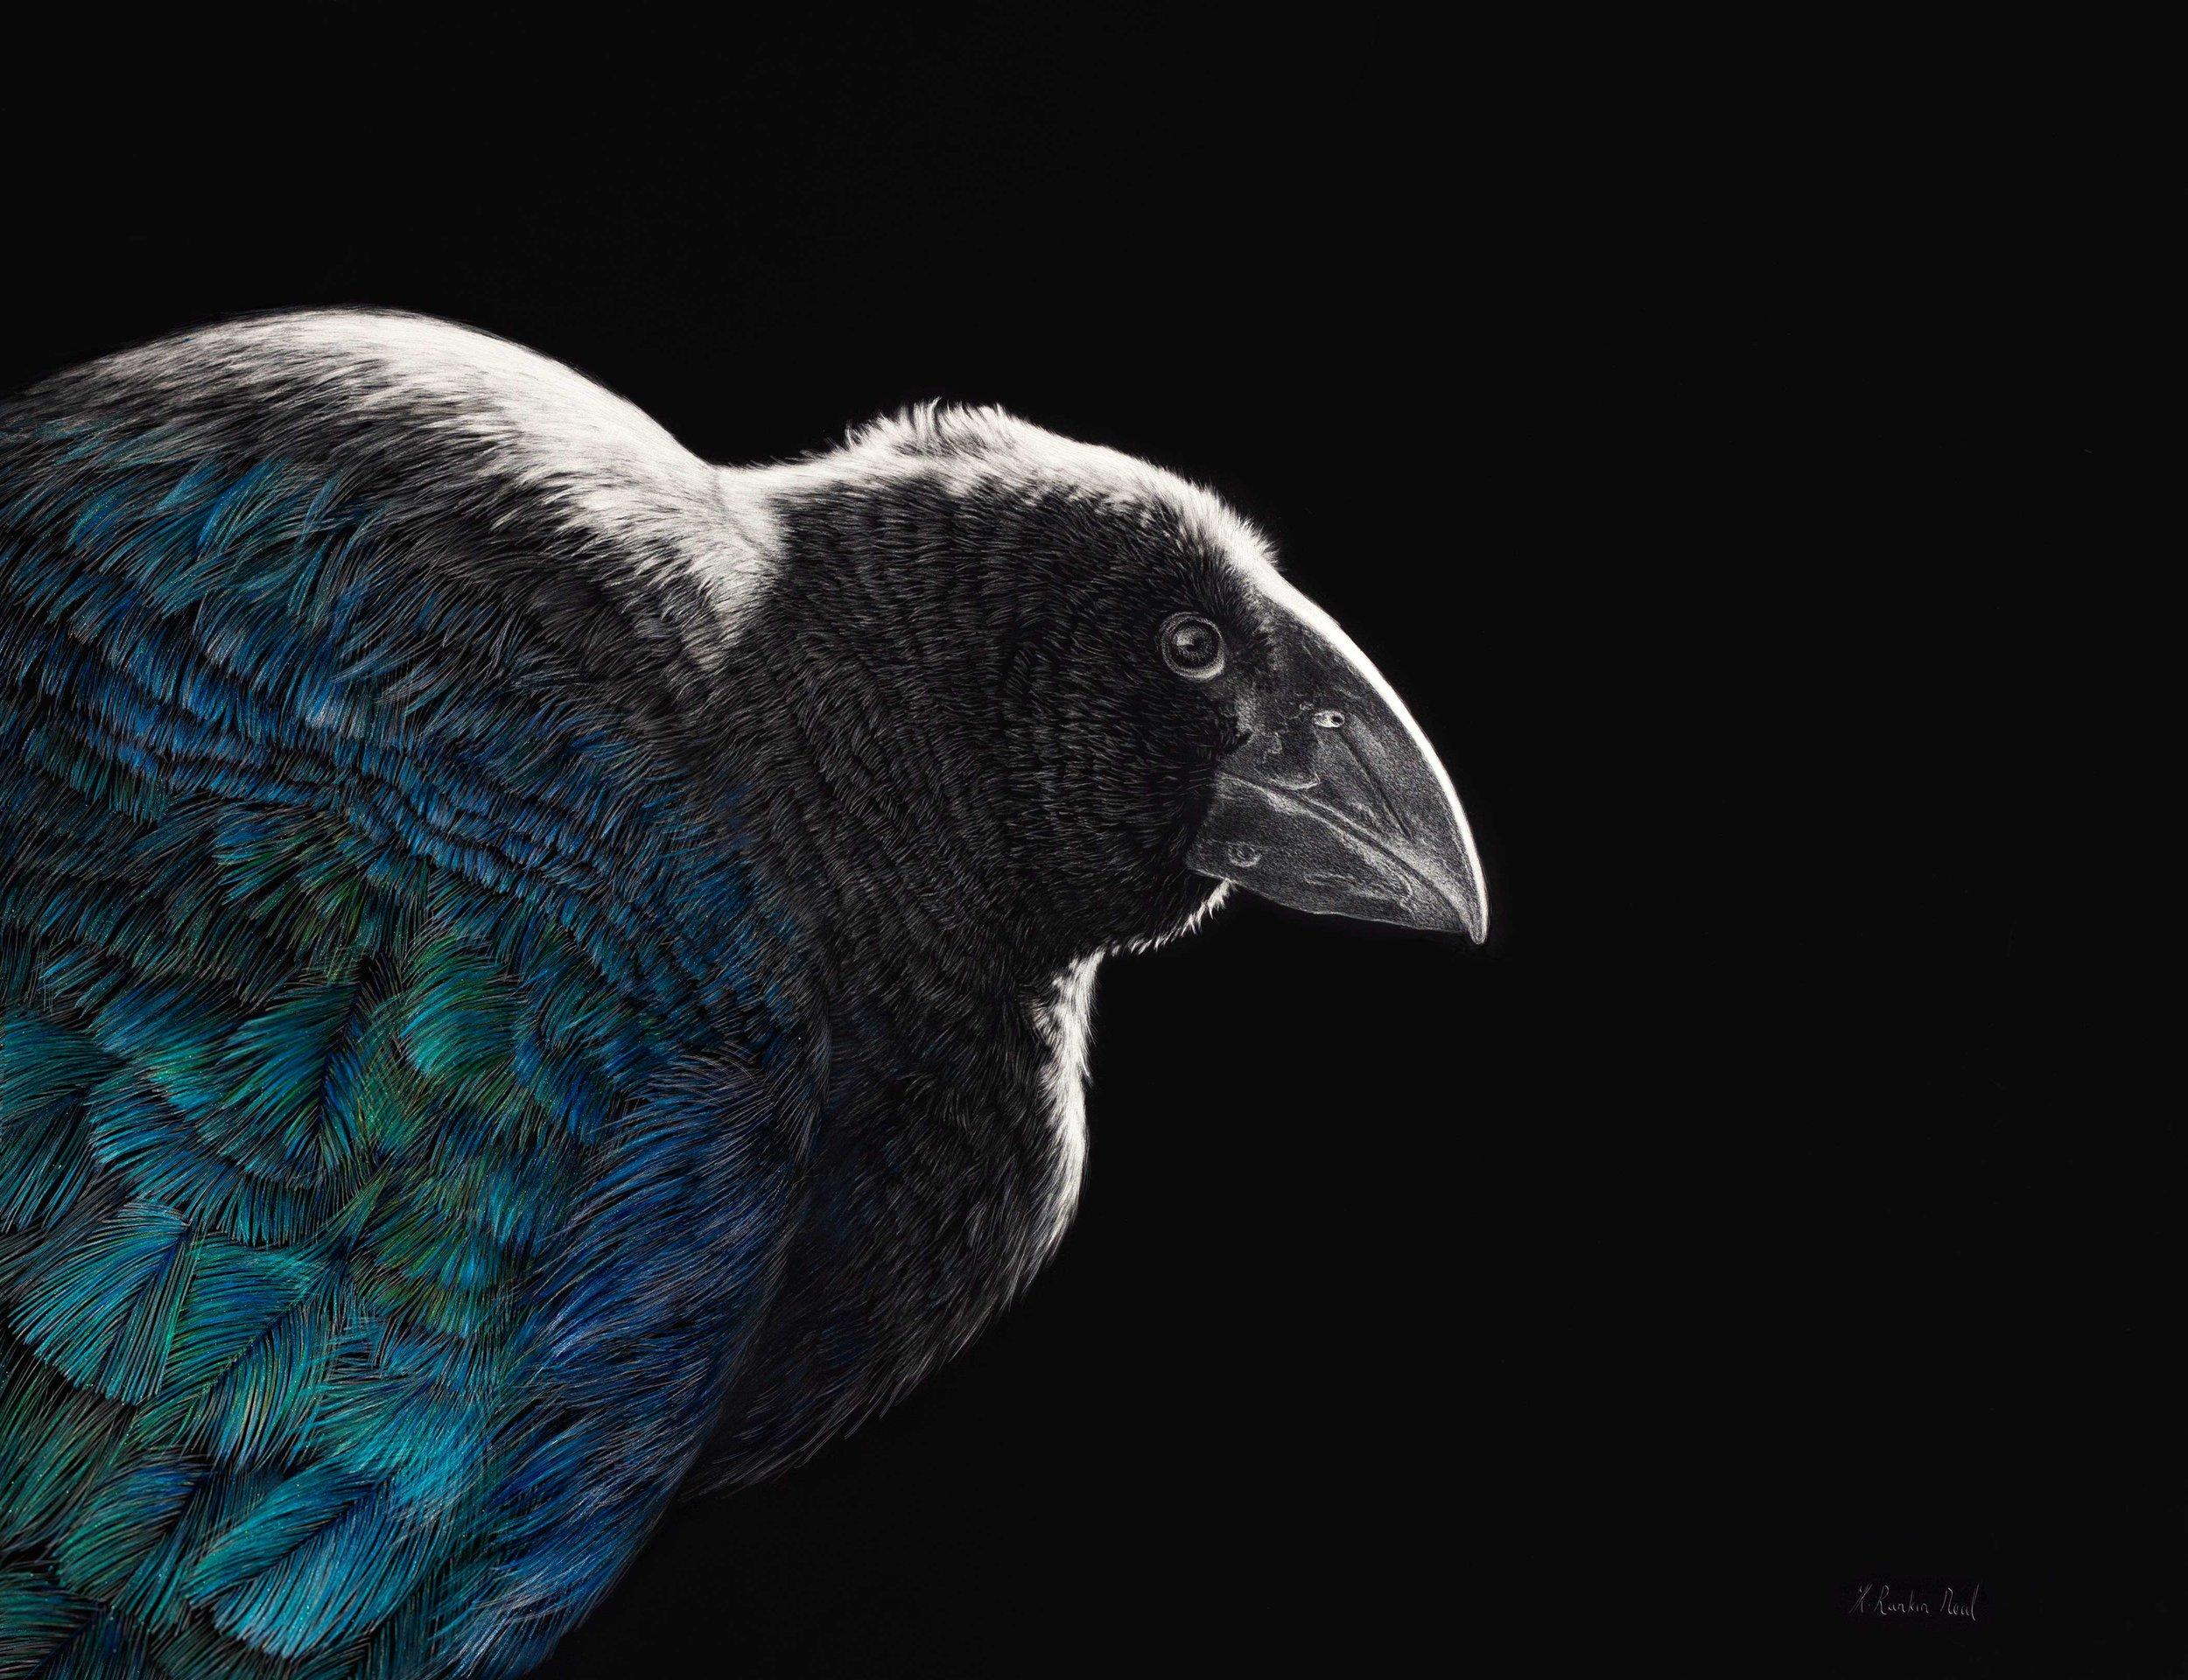 98---Karen-Rankin-Neal---Back-from-the-Brink-(NZ-Takahe)---$2850.jpg